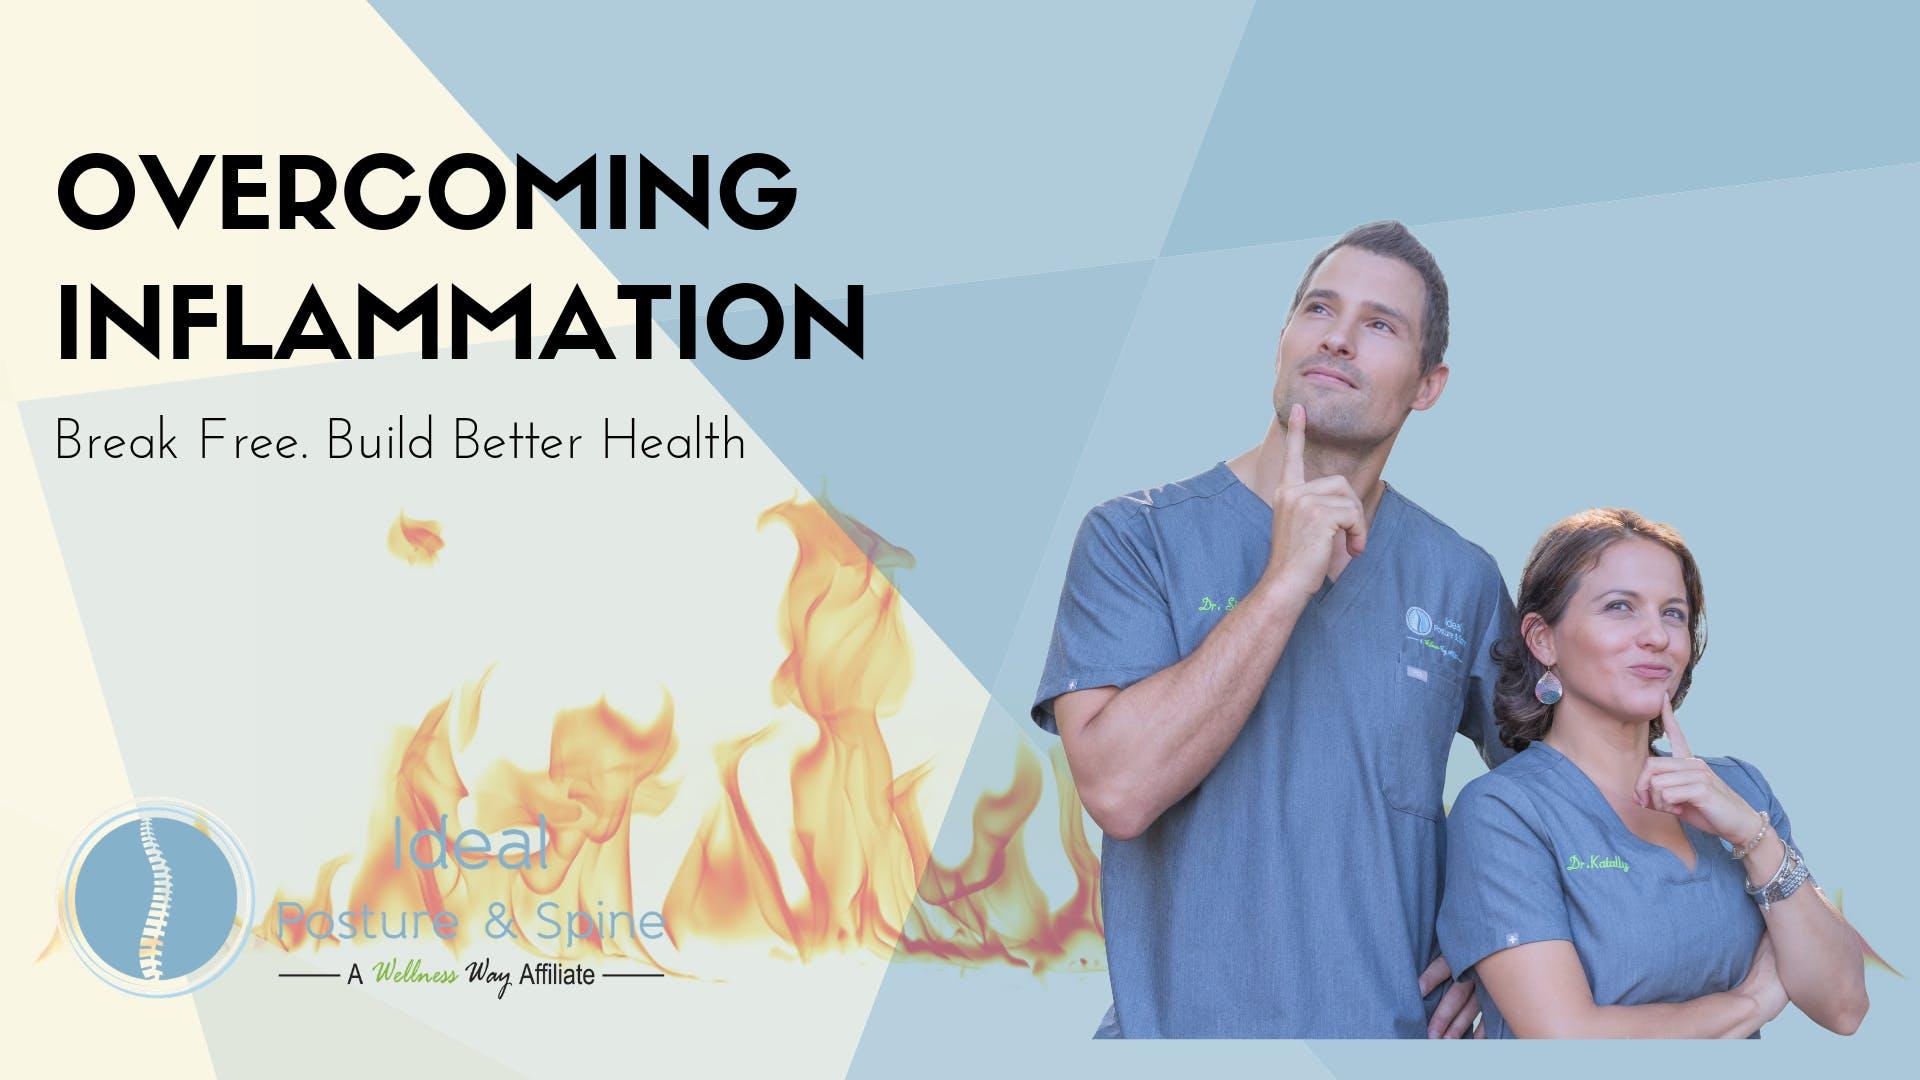 Overcoming Inflammation: Break Free. Build Better Health.